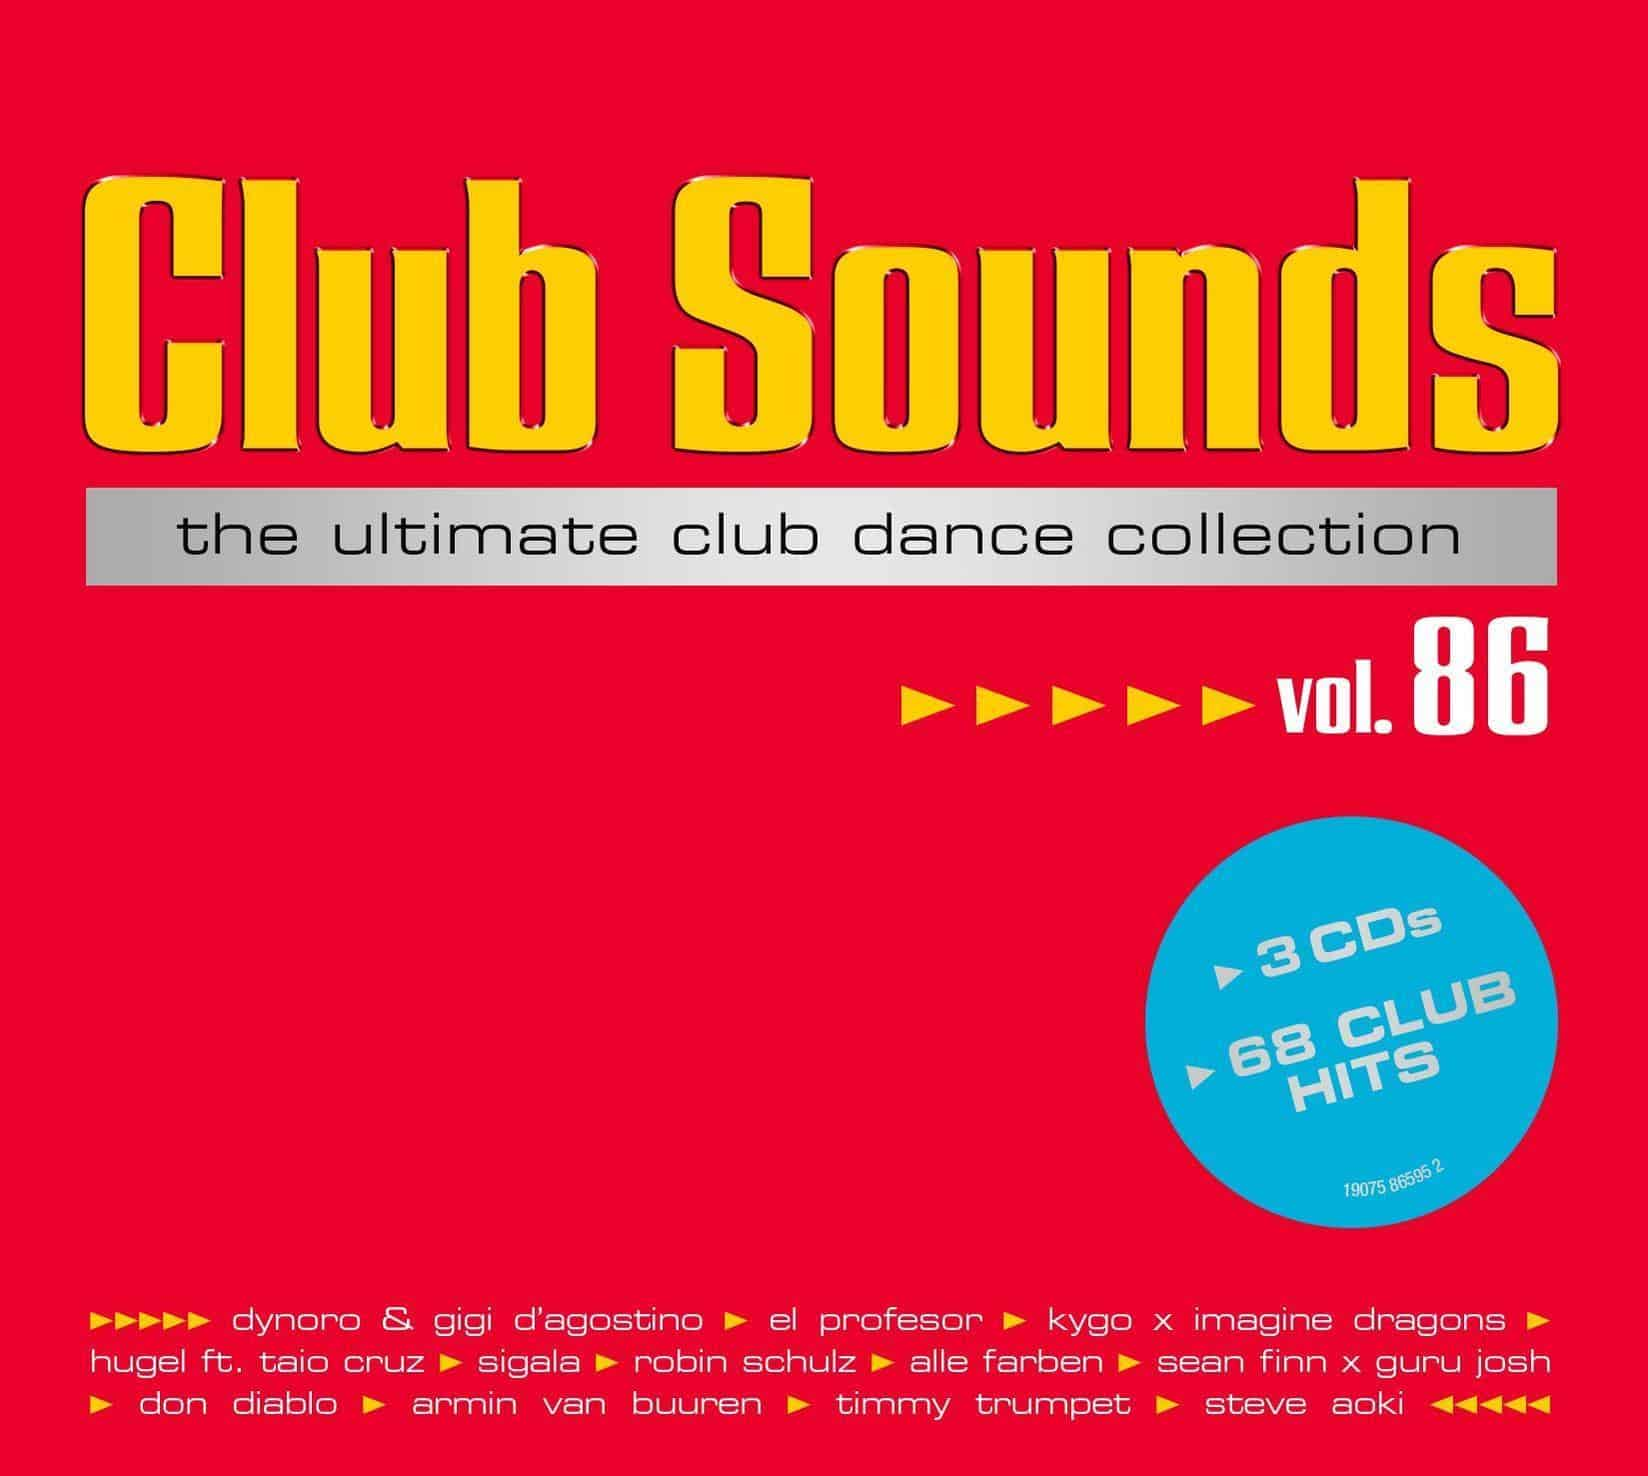 Club Sounds,Vol.86 (VARIOUS) für 19,99 Euro